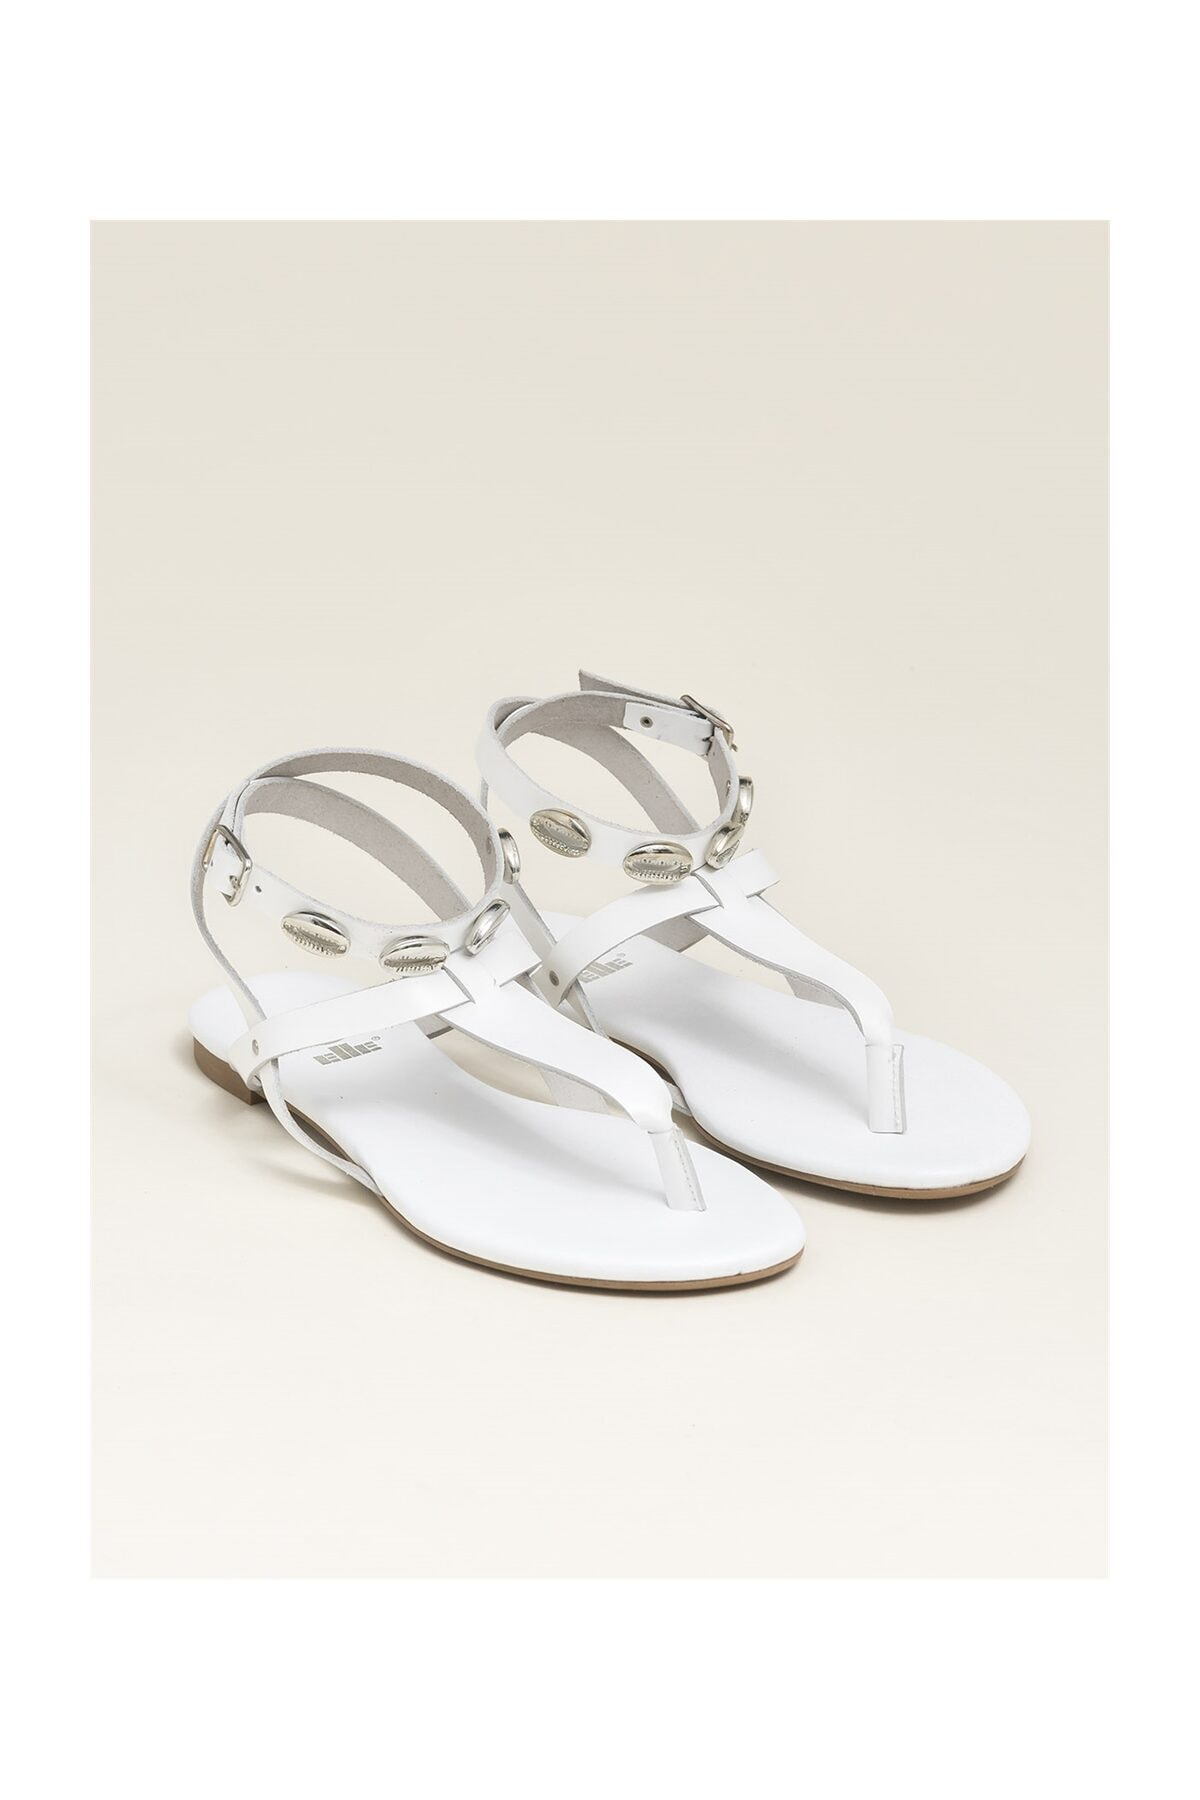 Elle Shoes Tate Kadın Sandalet 2